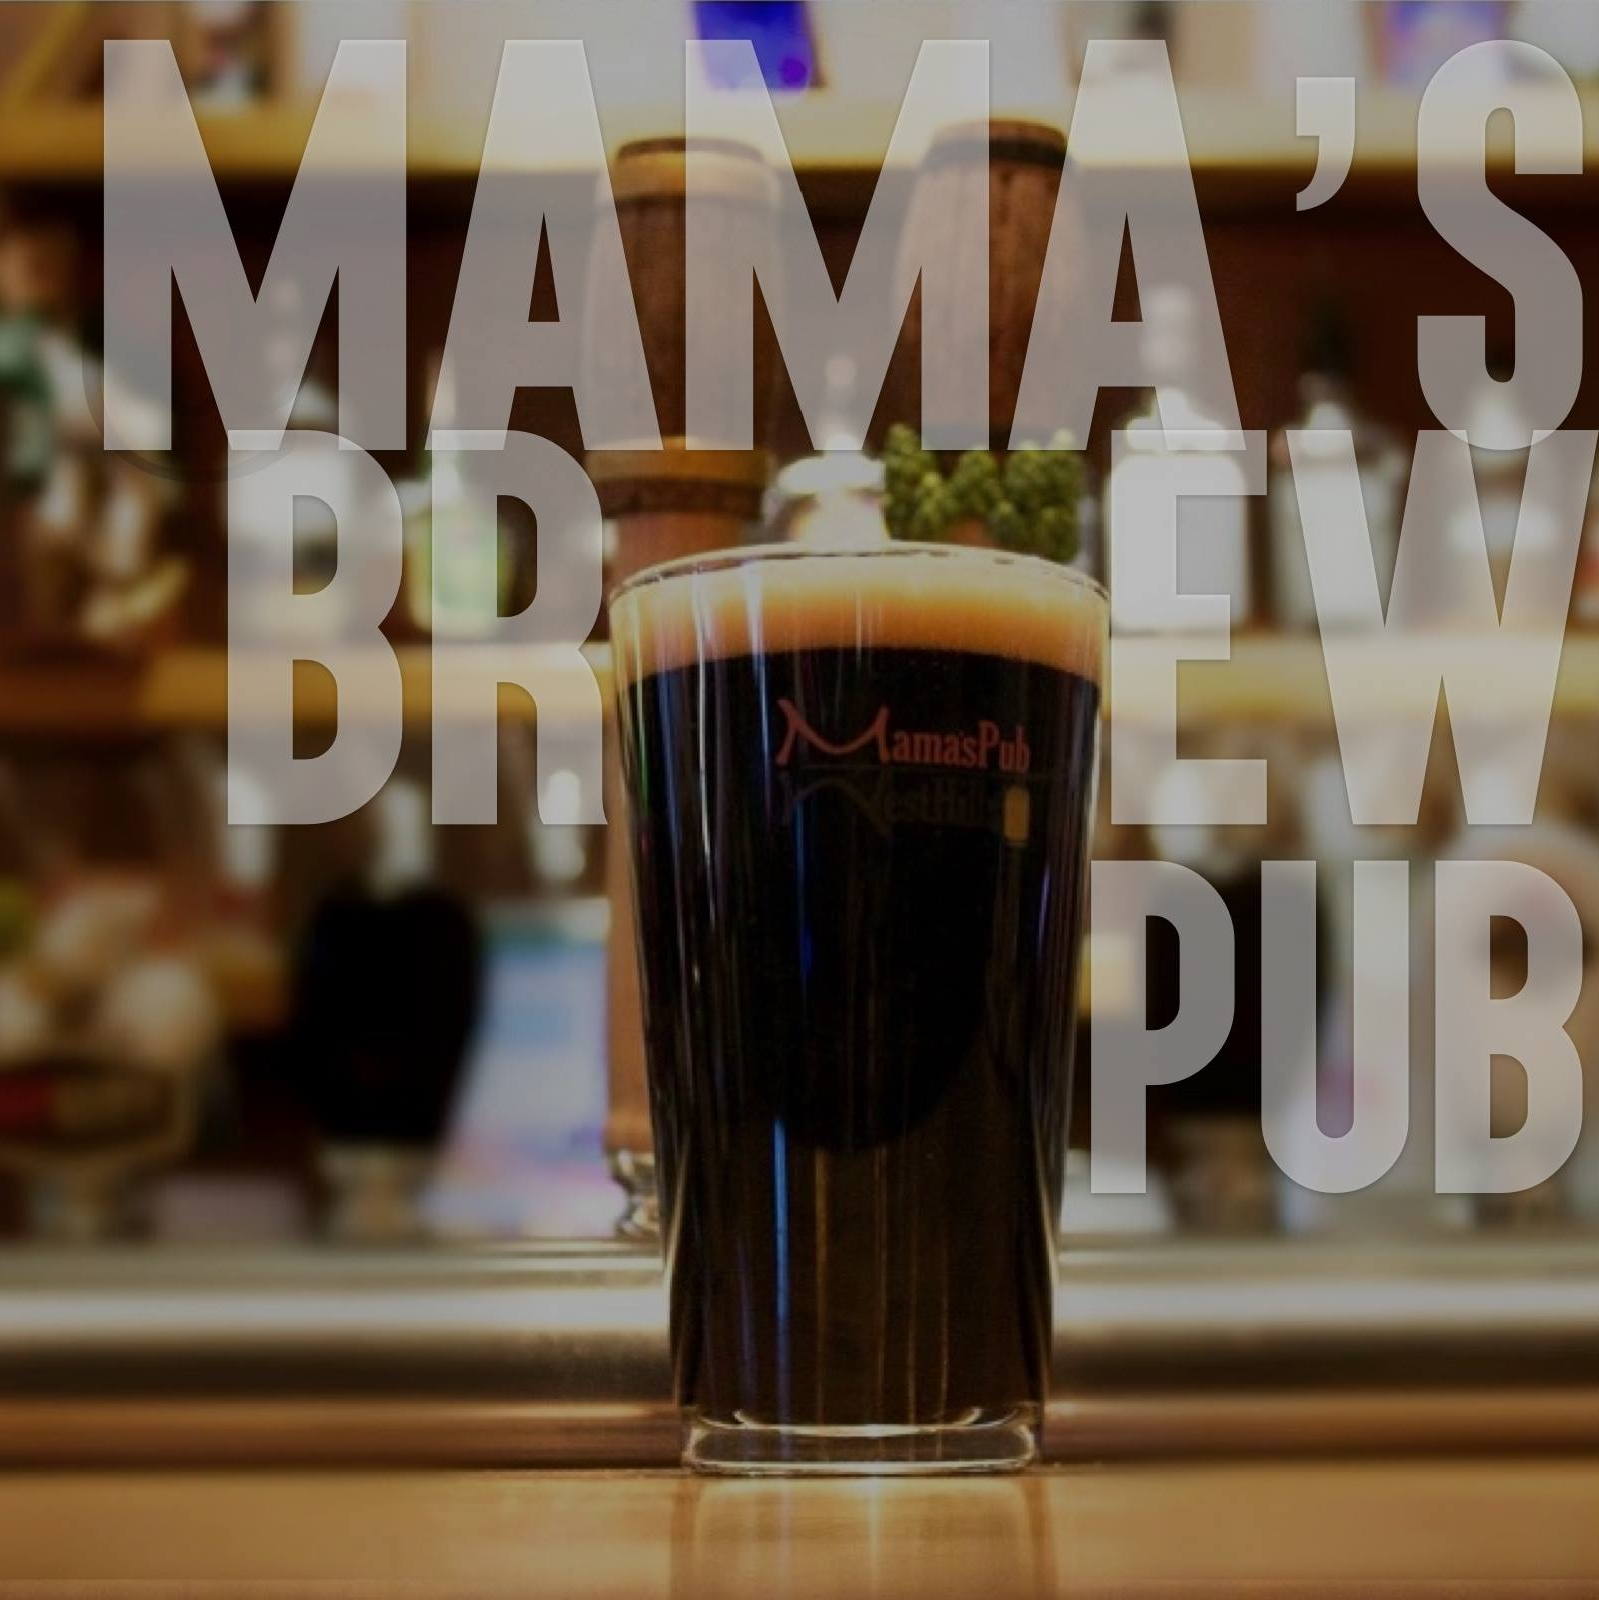 MamasBrewPub